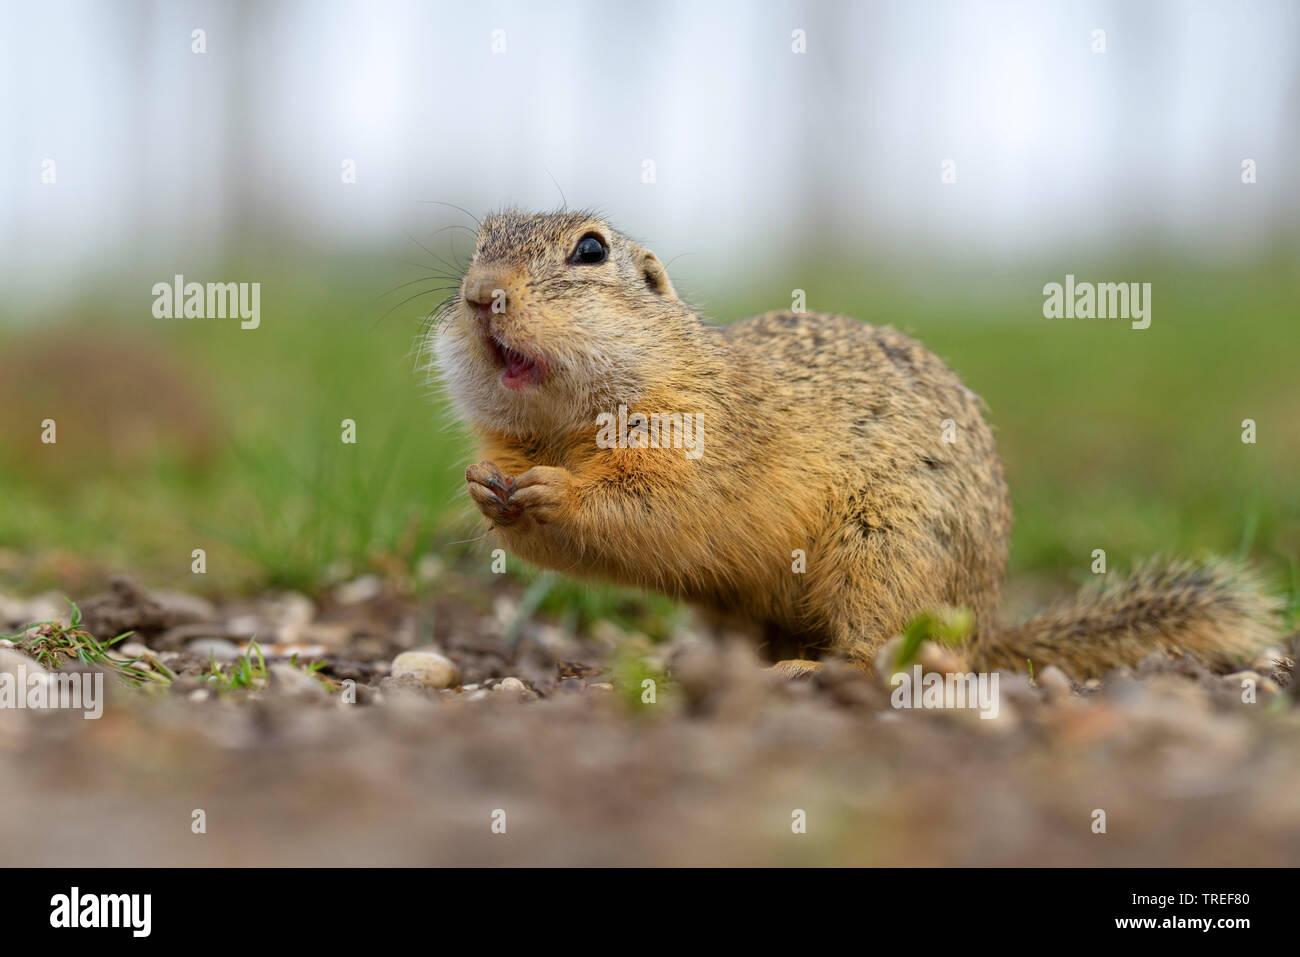 European ground squirrel, European suslik, European souslik (Citellus citellus, Spermophilus citellus), foraging on the ground, side view, Austria, Burgenland, Neusiedler See National Park Stock Photo